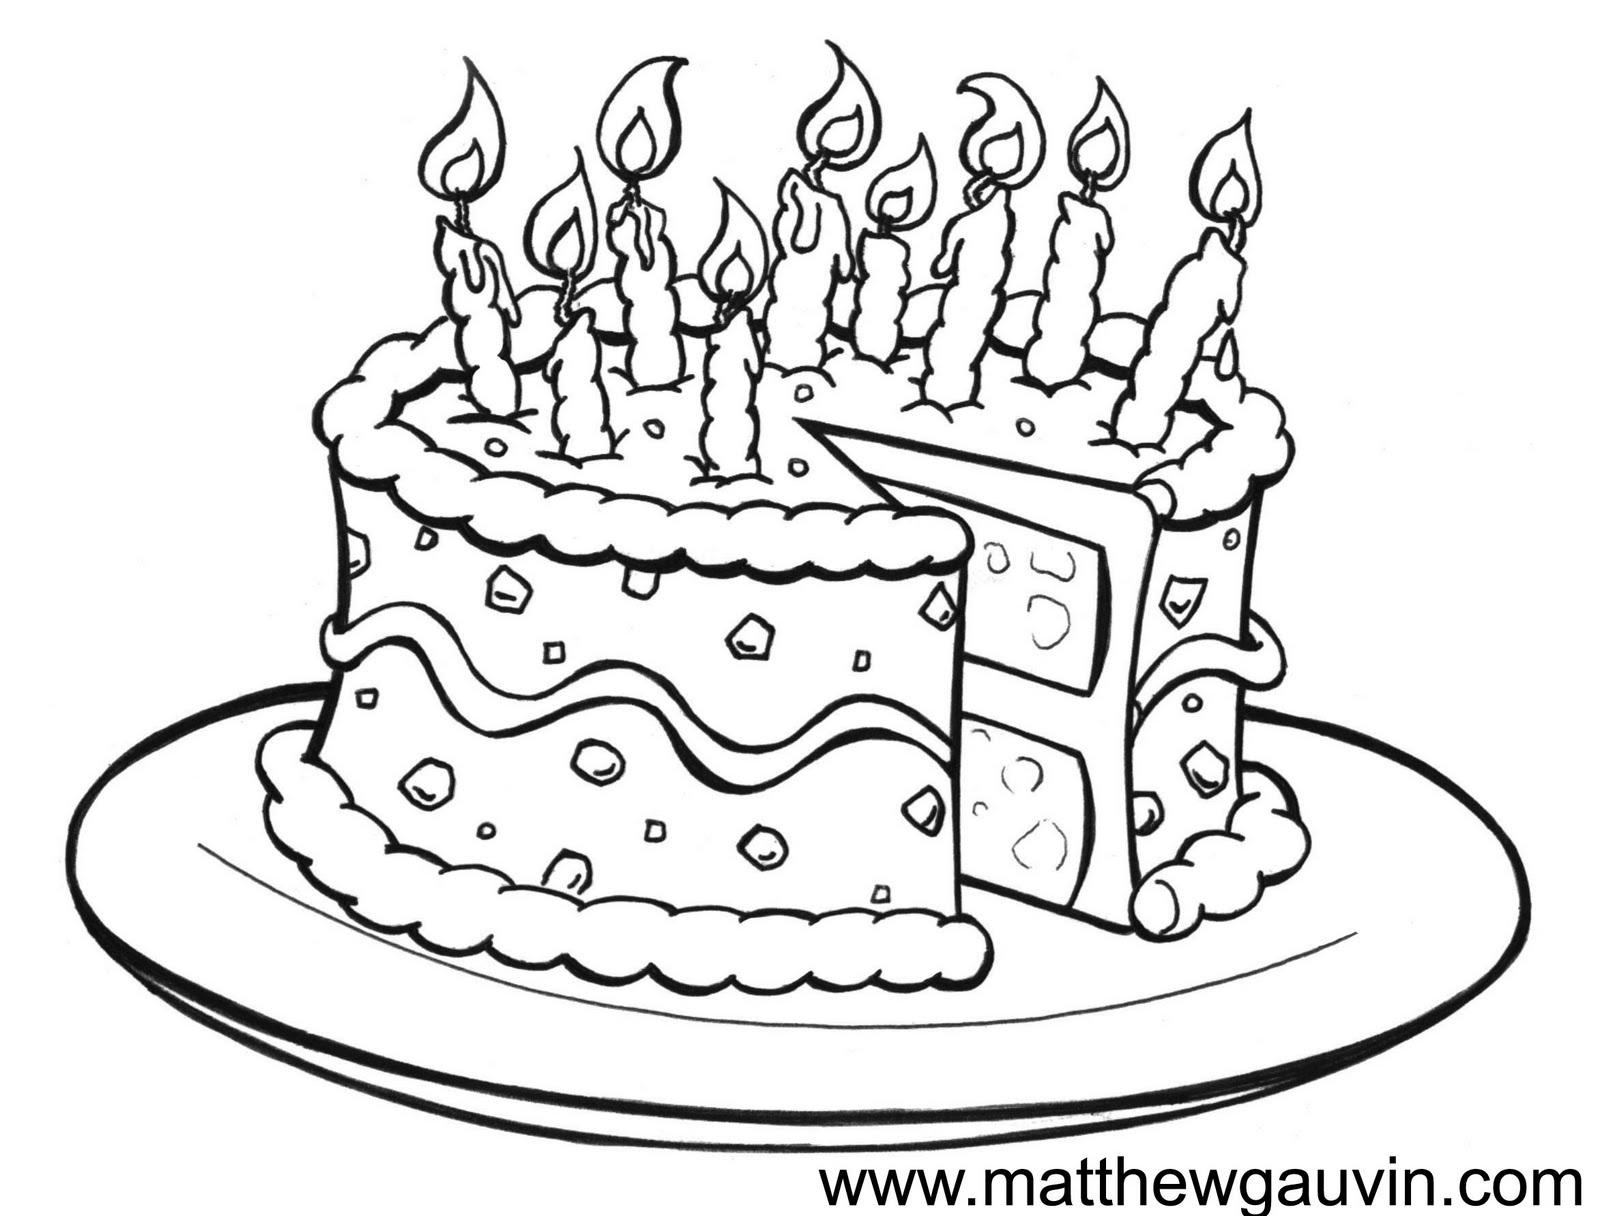 1600x1216 Mg Children's Book Illustrations Birthday Cake Line Drawing